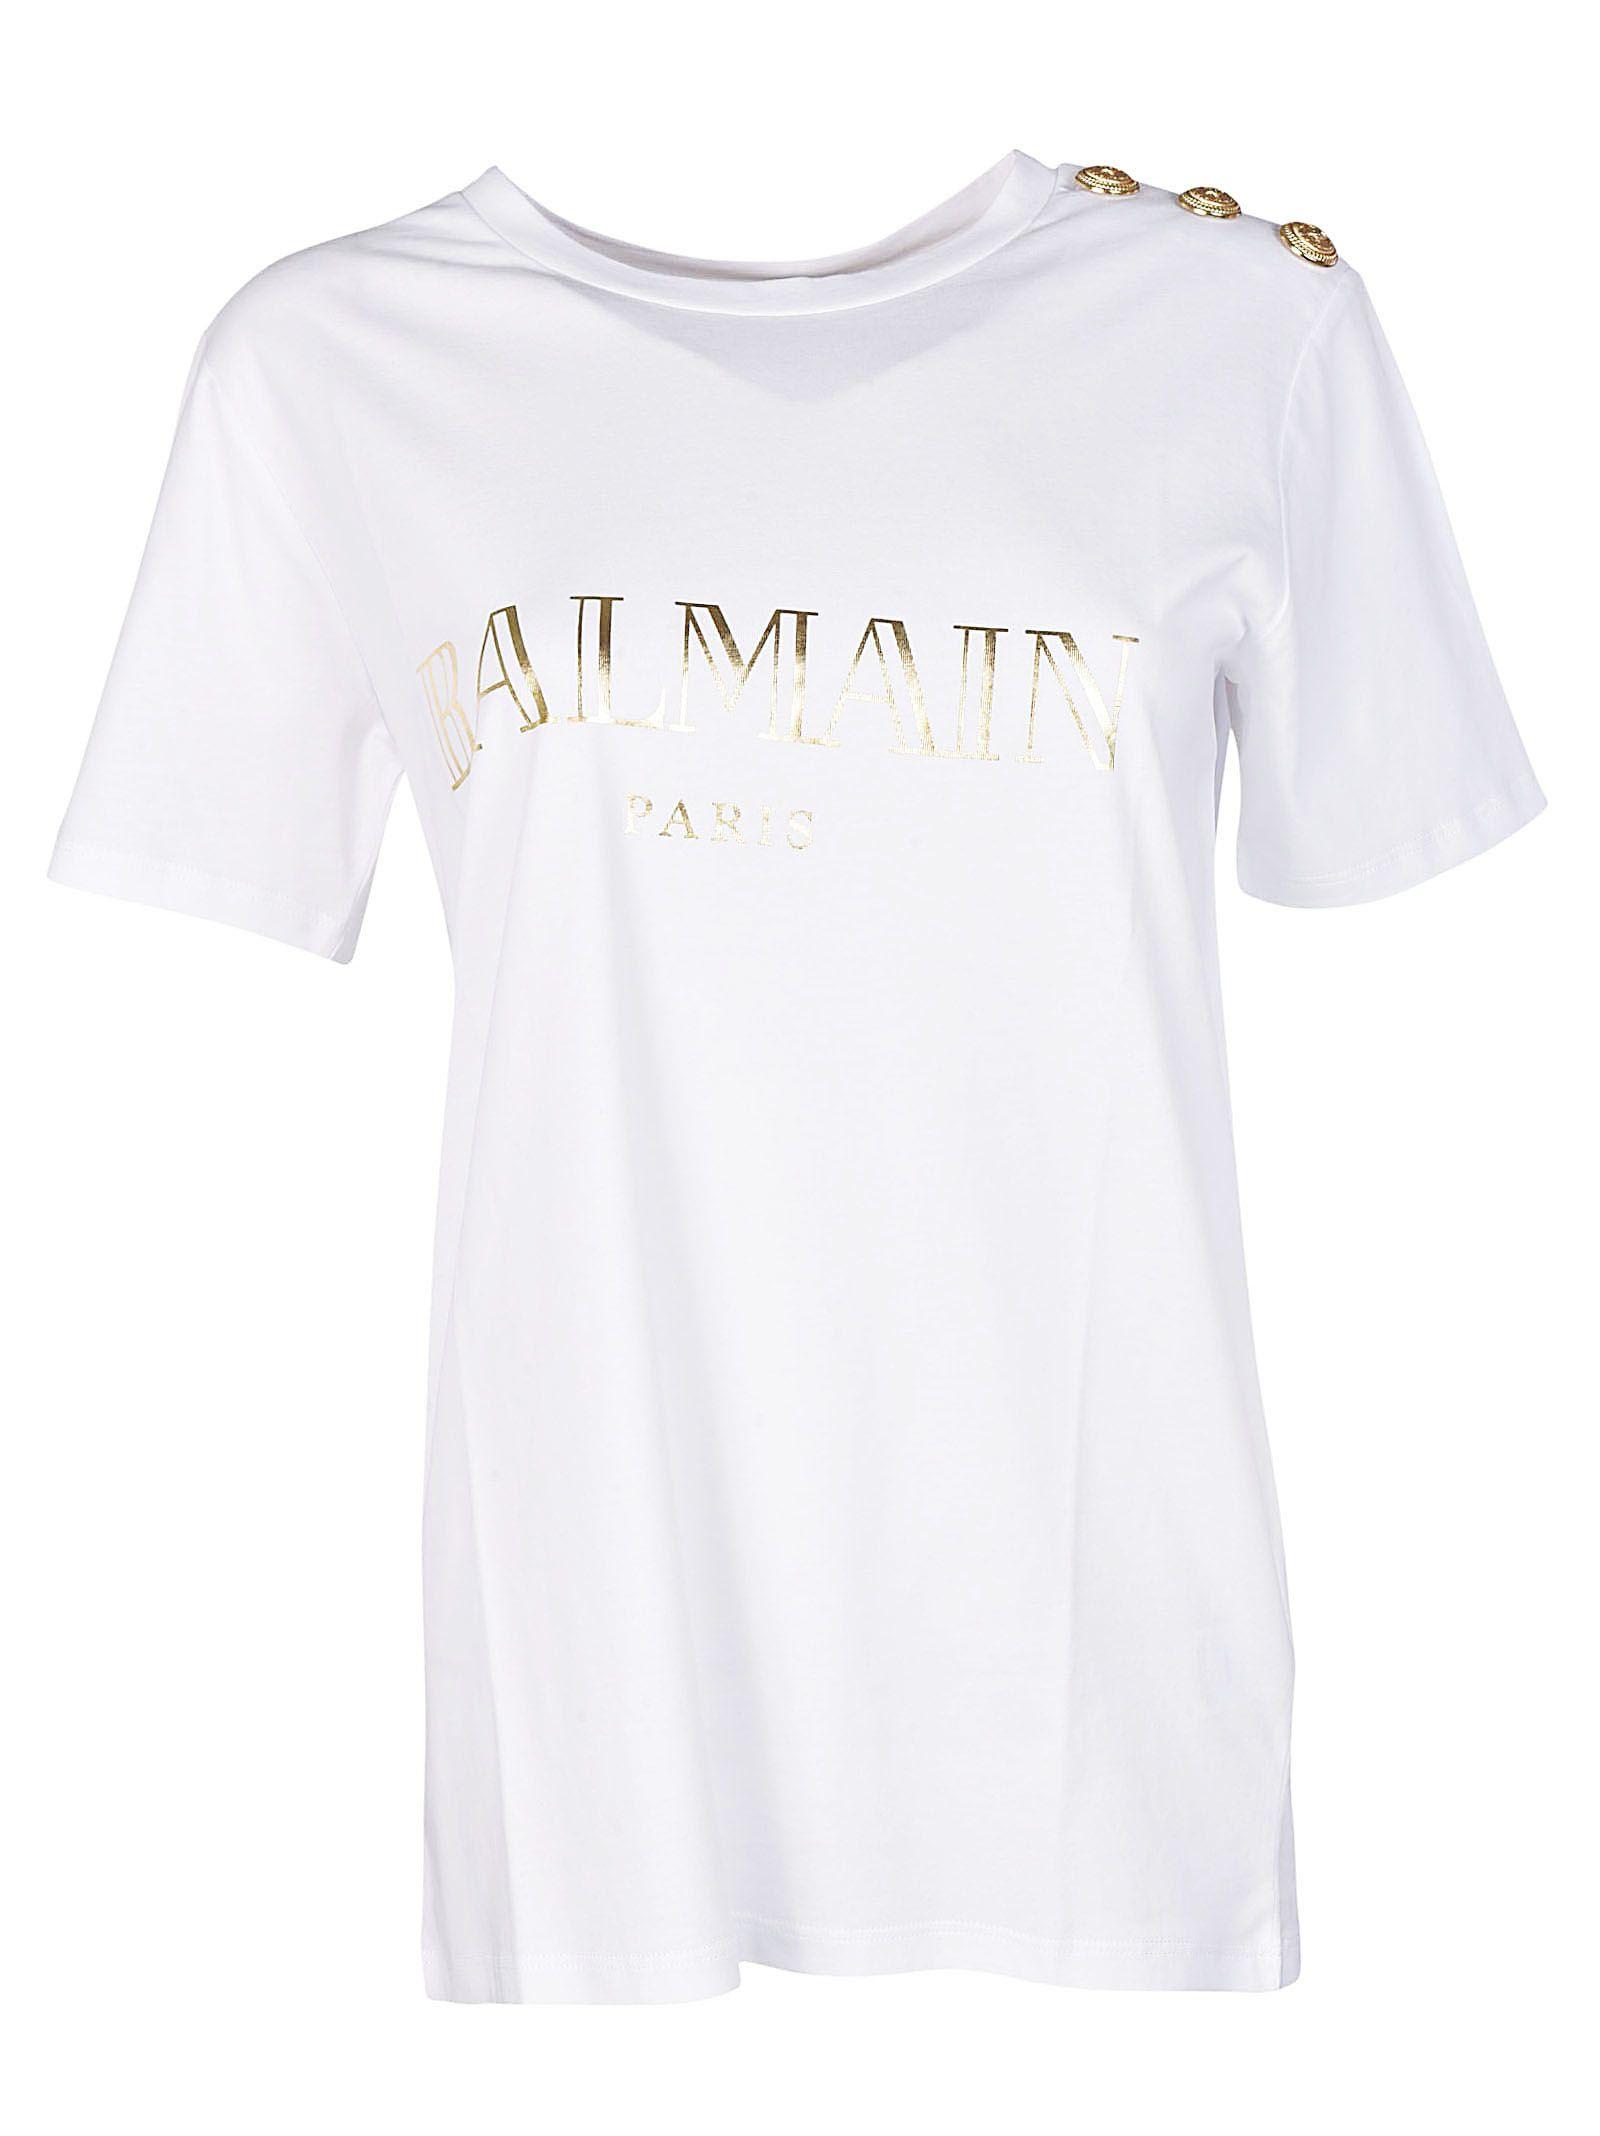 Balmain logo printed cotton jersey t shirt in white modesens for Balmain white logo t shirt